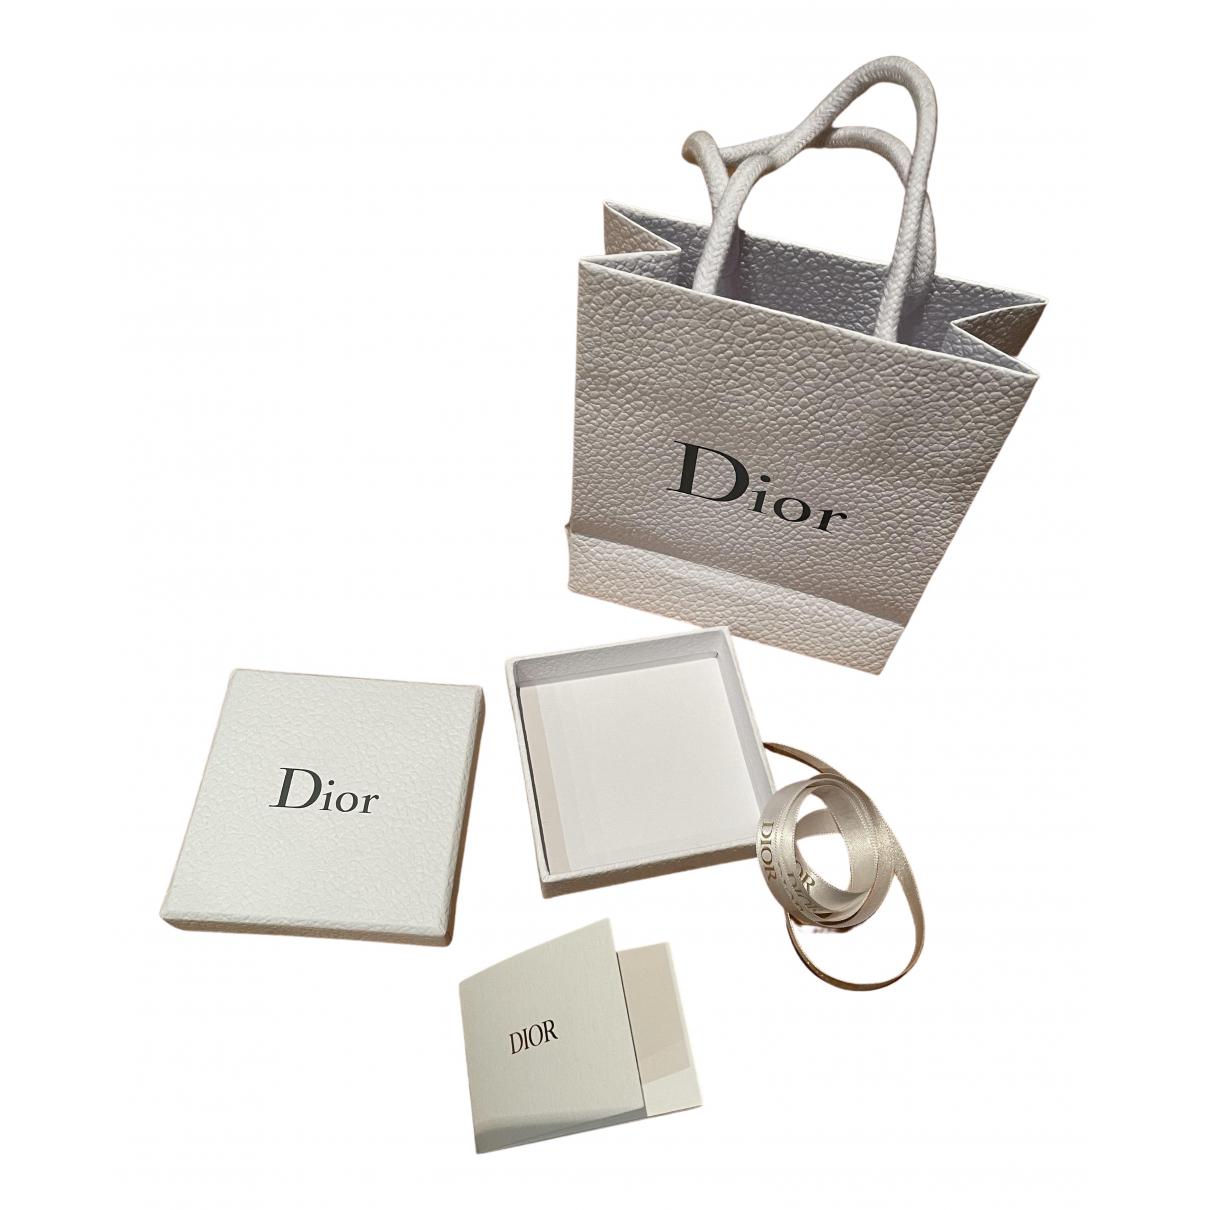 Objeto de decoracion Dior